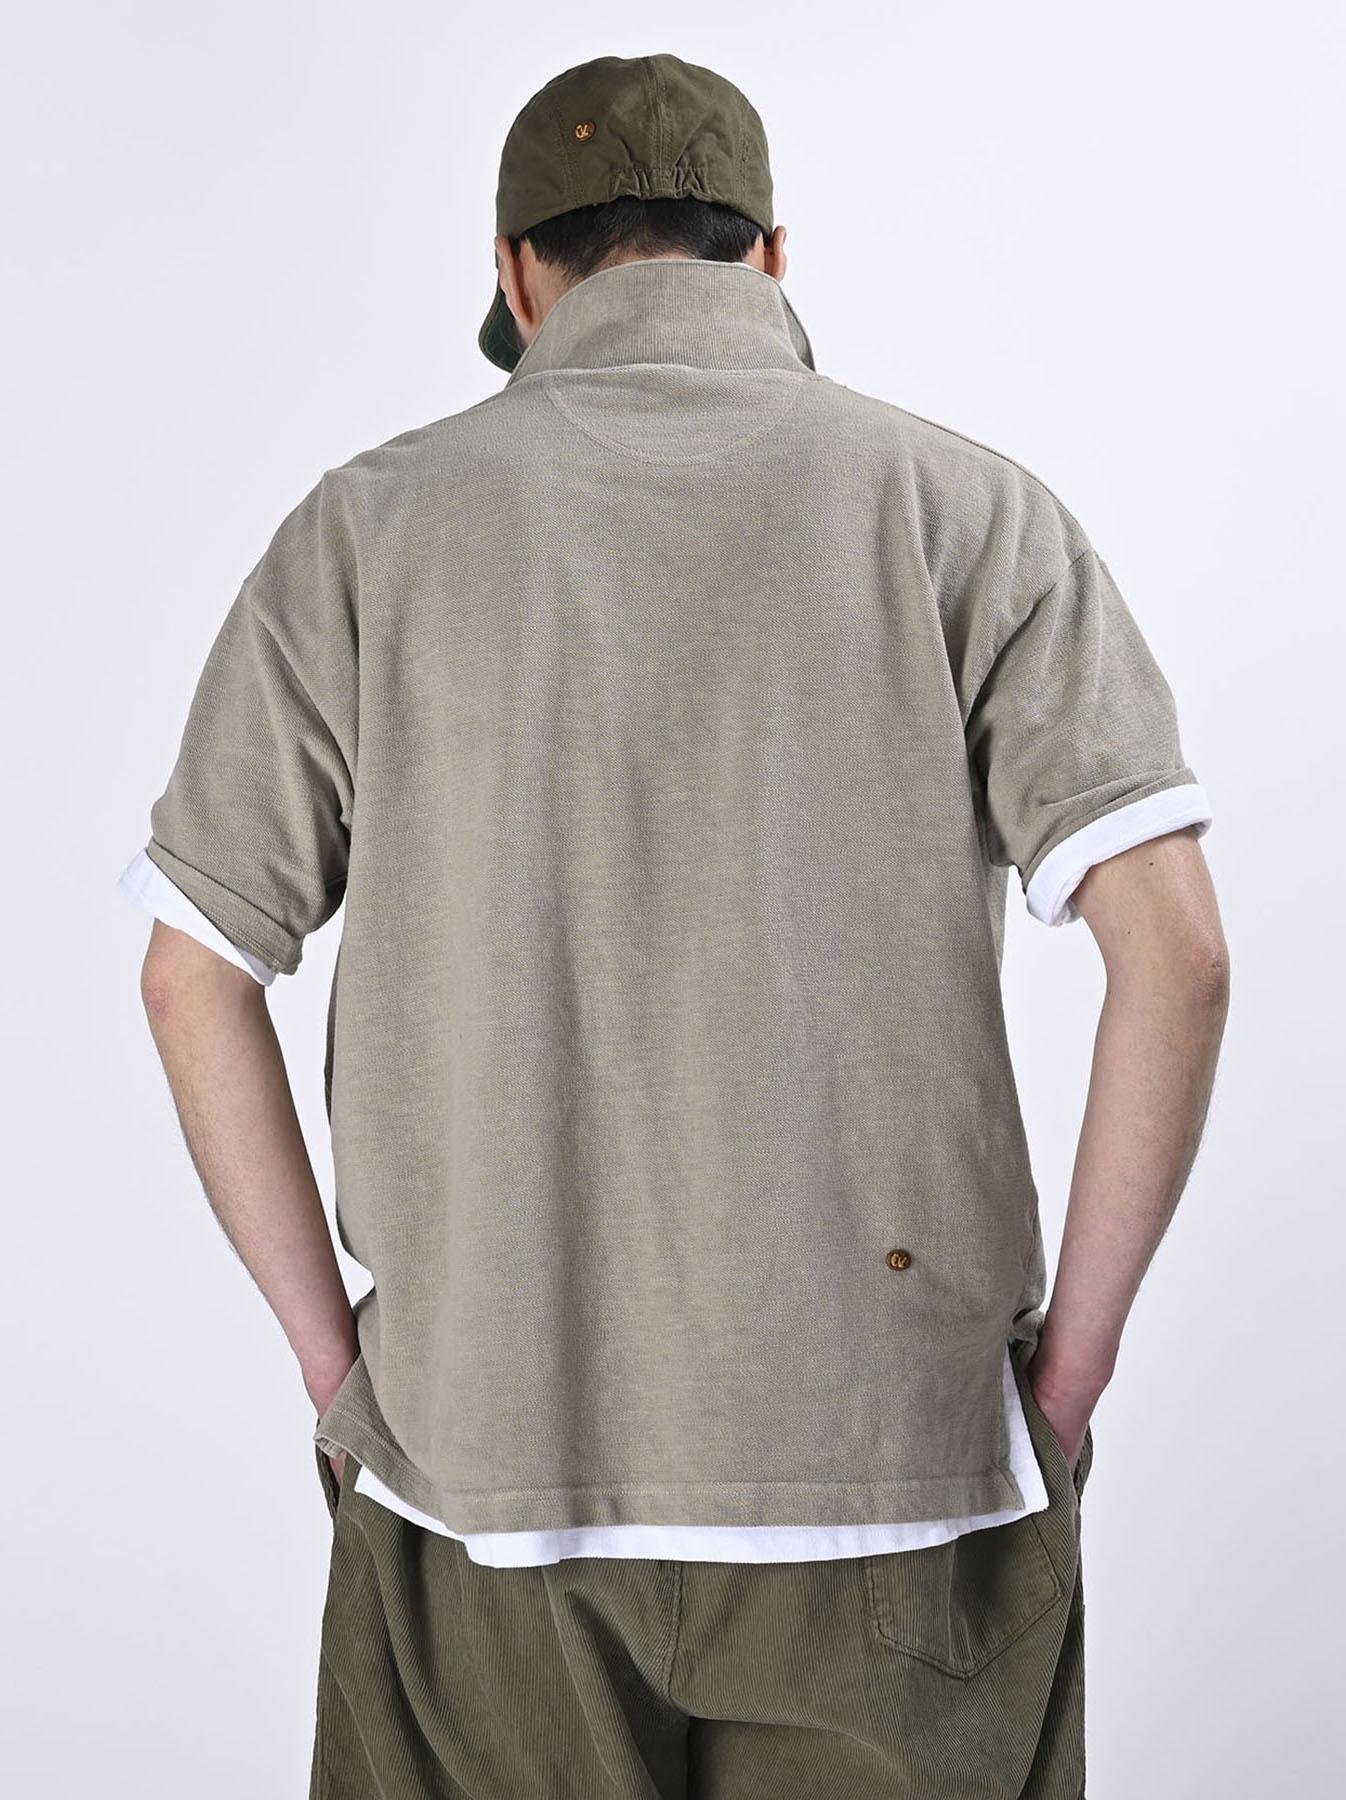 Kanoko Ocean Shiokaze Short-sleeved Polo Shirt (0521)-5